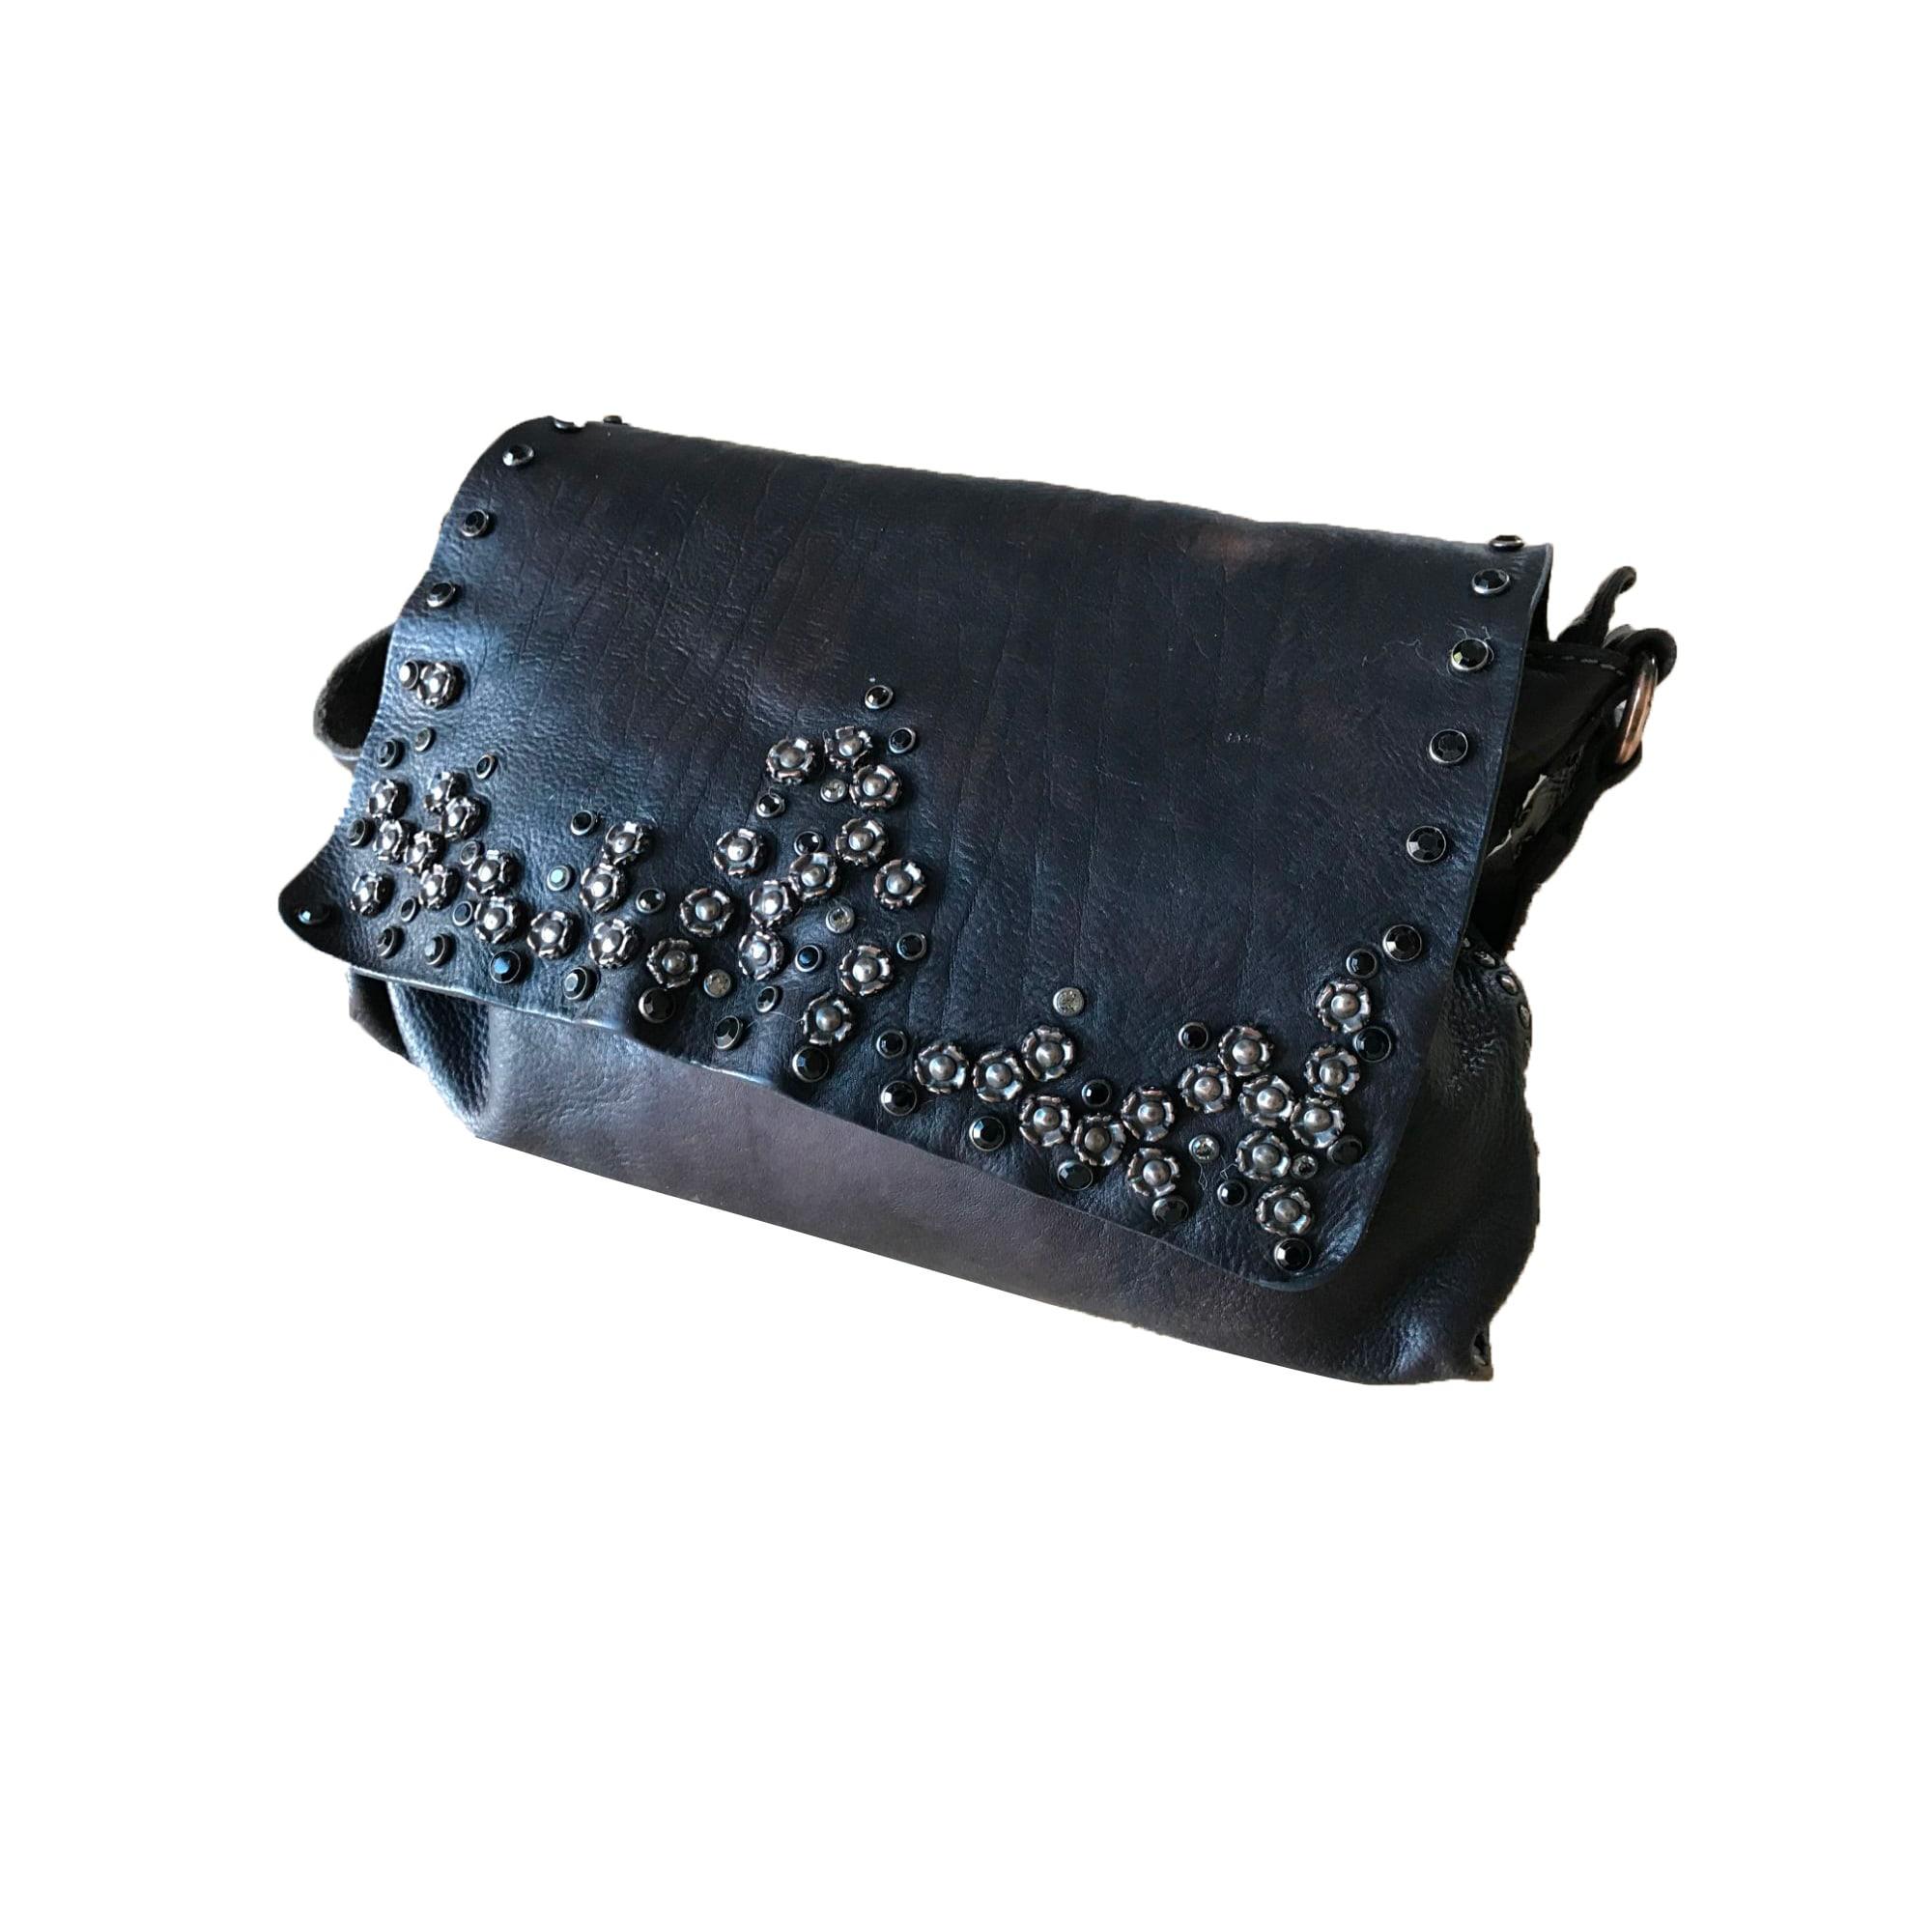 CAMPOMAGGI cuir Sac bandoulière en Noir en waI6YSxq4